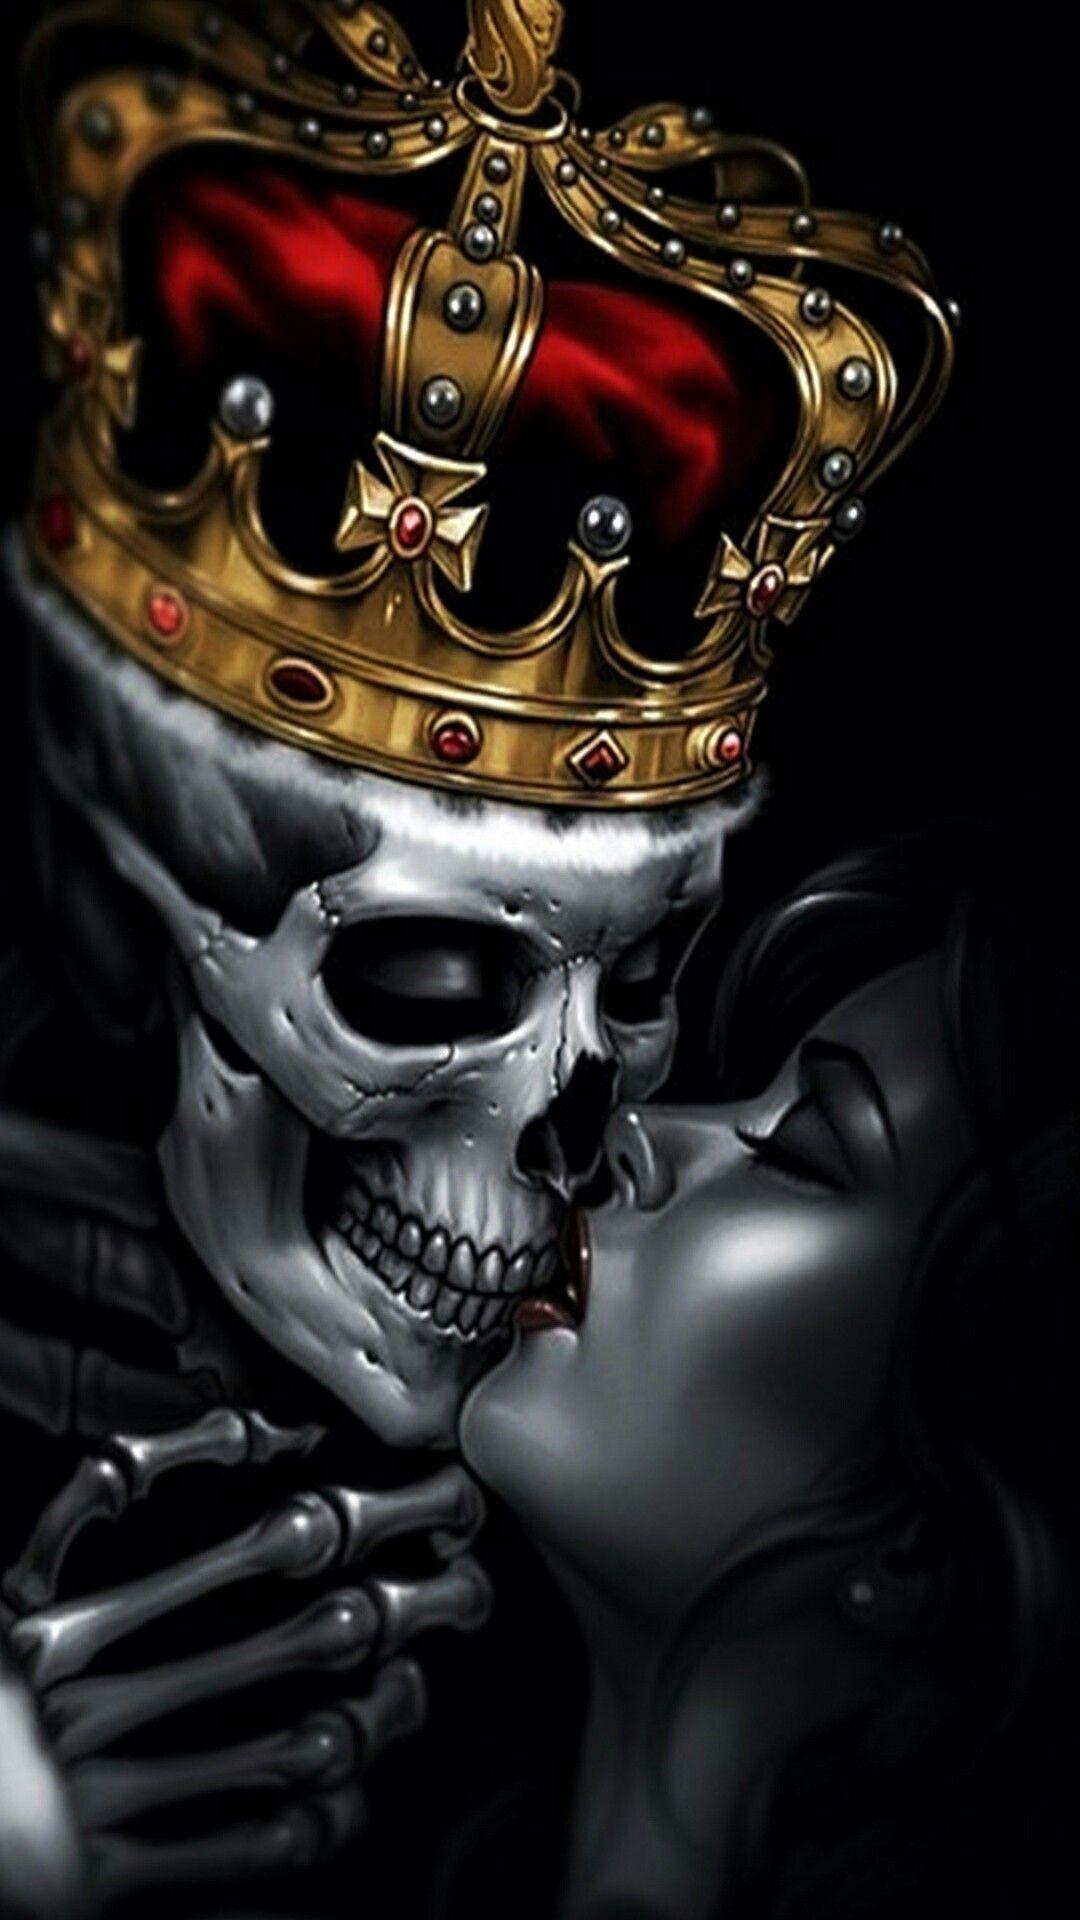 King skull kissing the queen king skull tattoo popular for King and queen skull tattoos